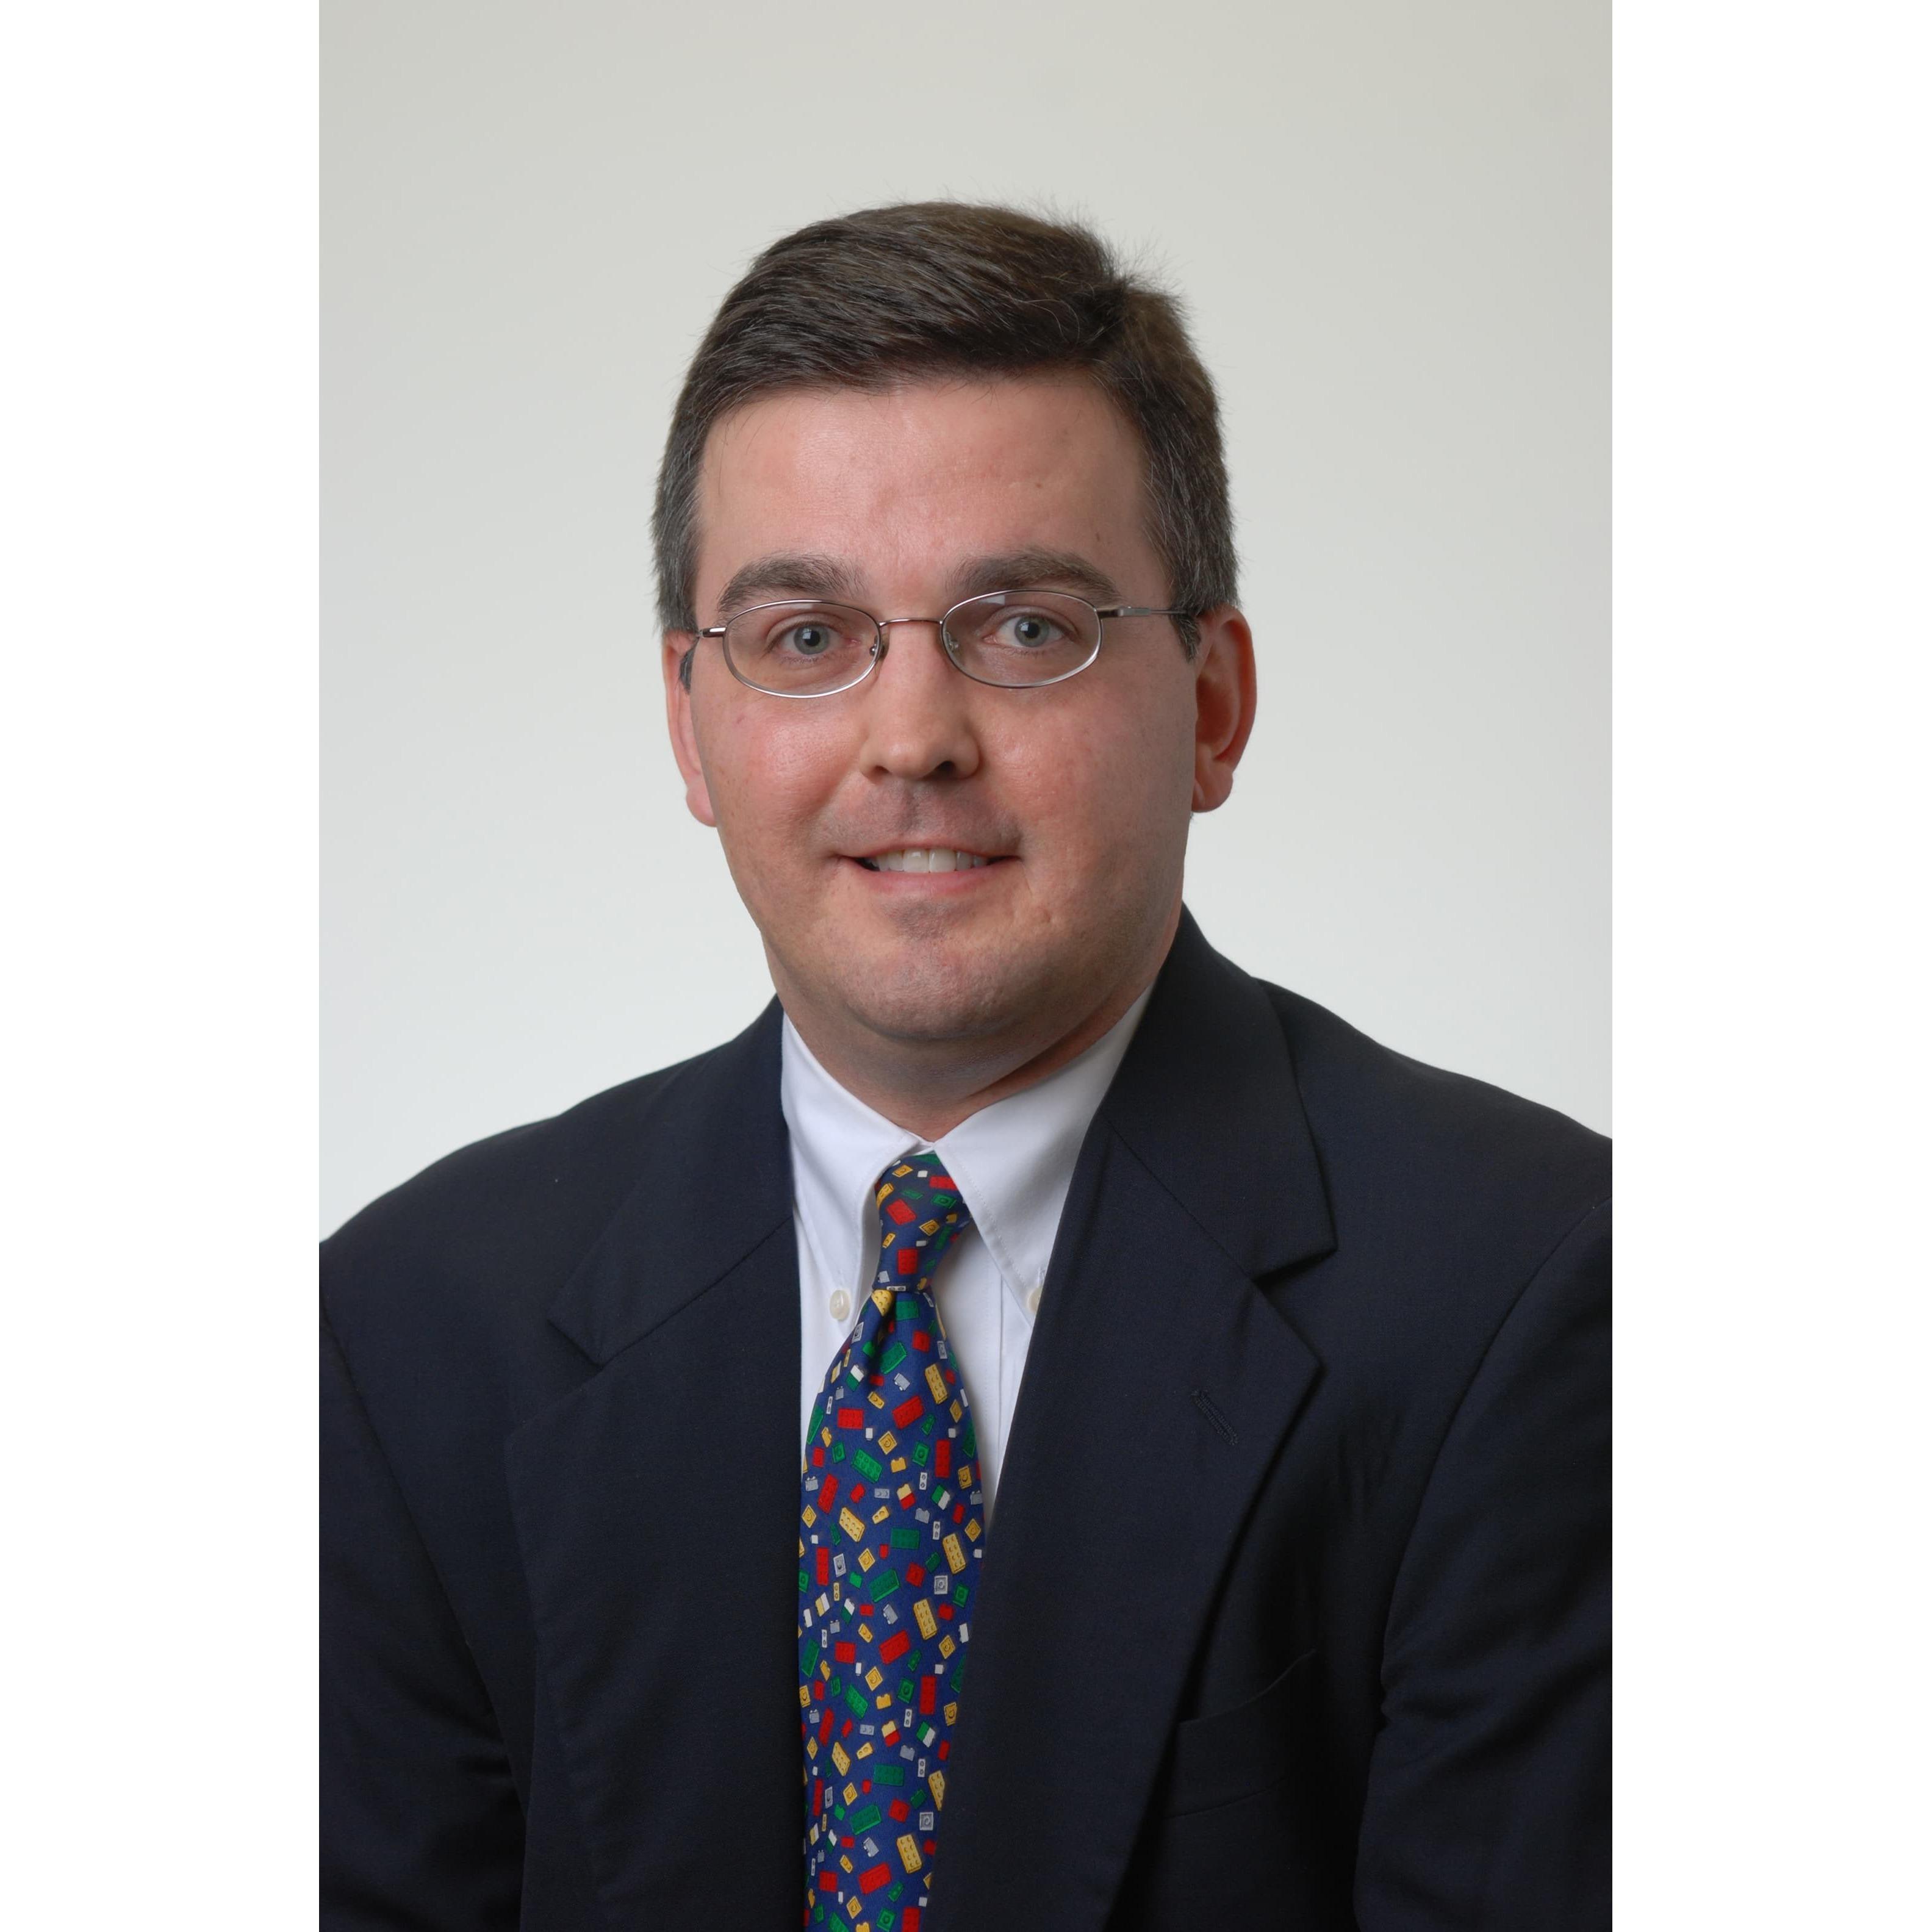 Todd D Nebesio, MD